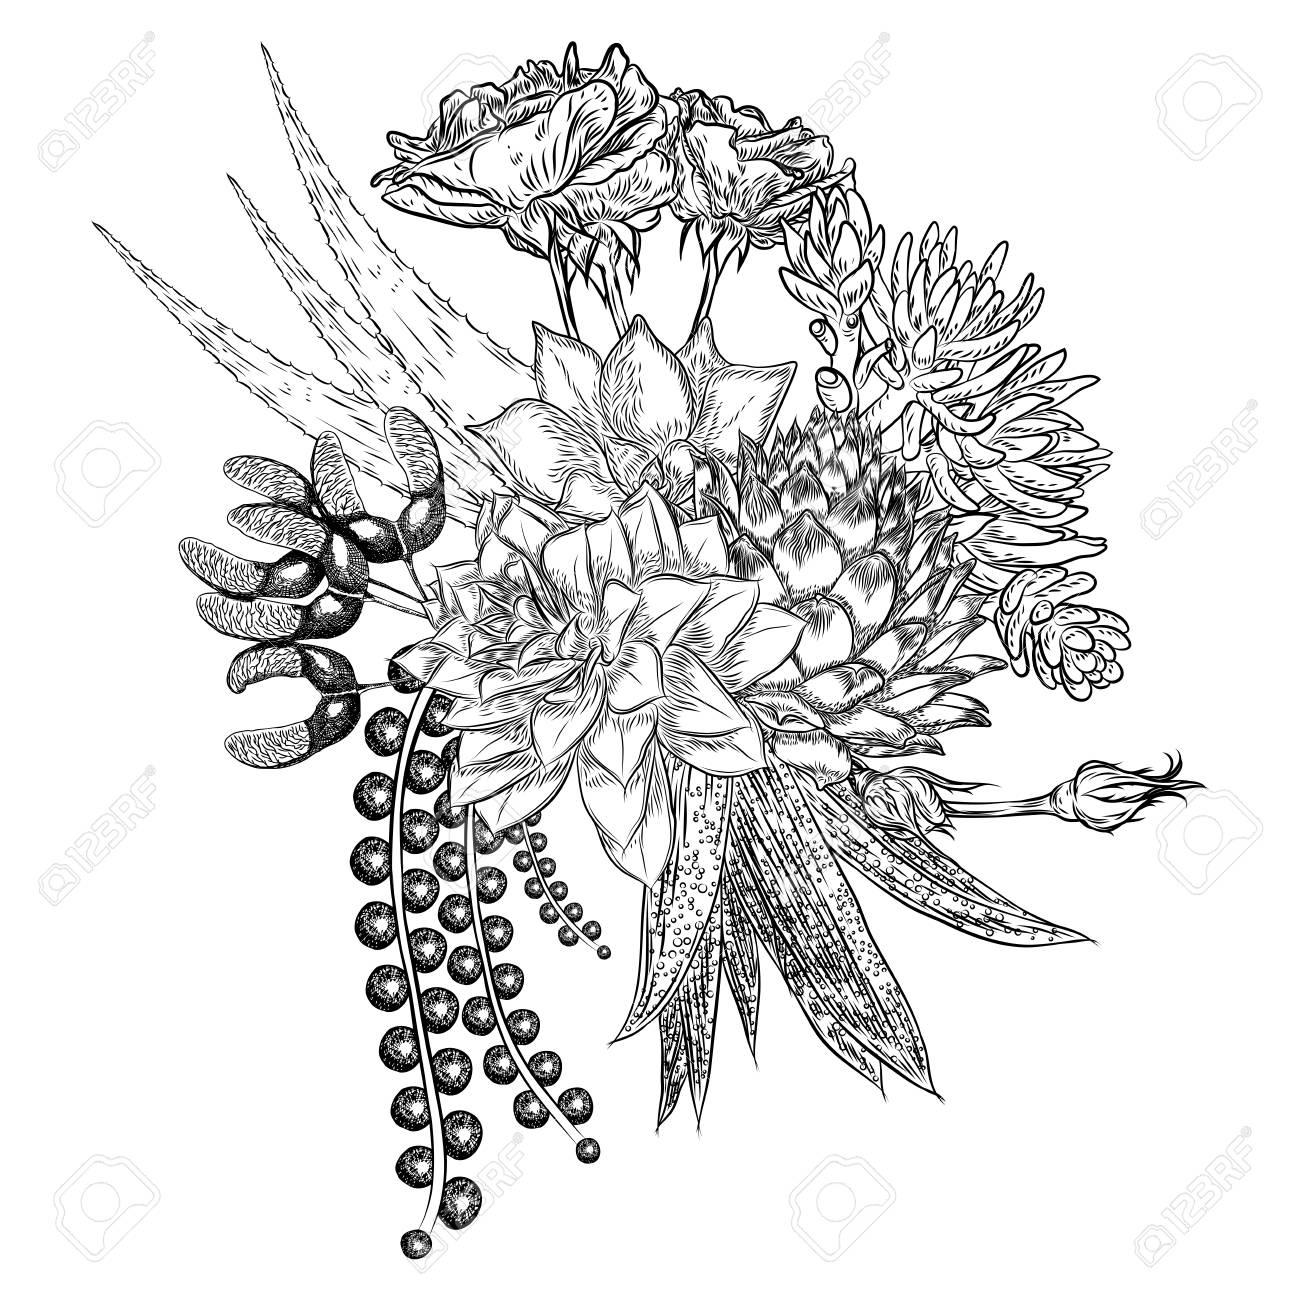 Green Plant Clip Art at Clker.com - vector clip art online, royalty free &  public domain